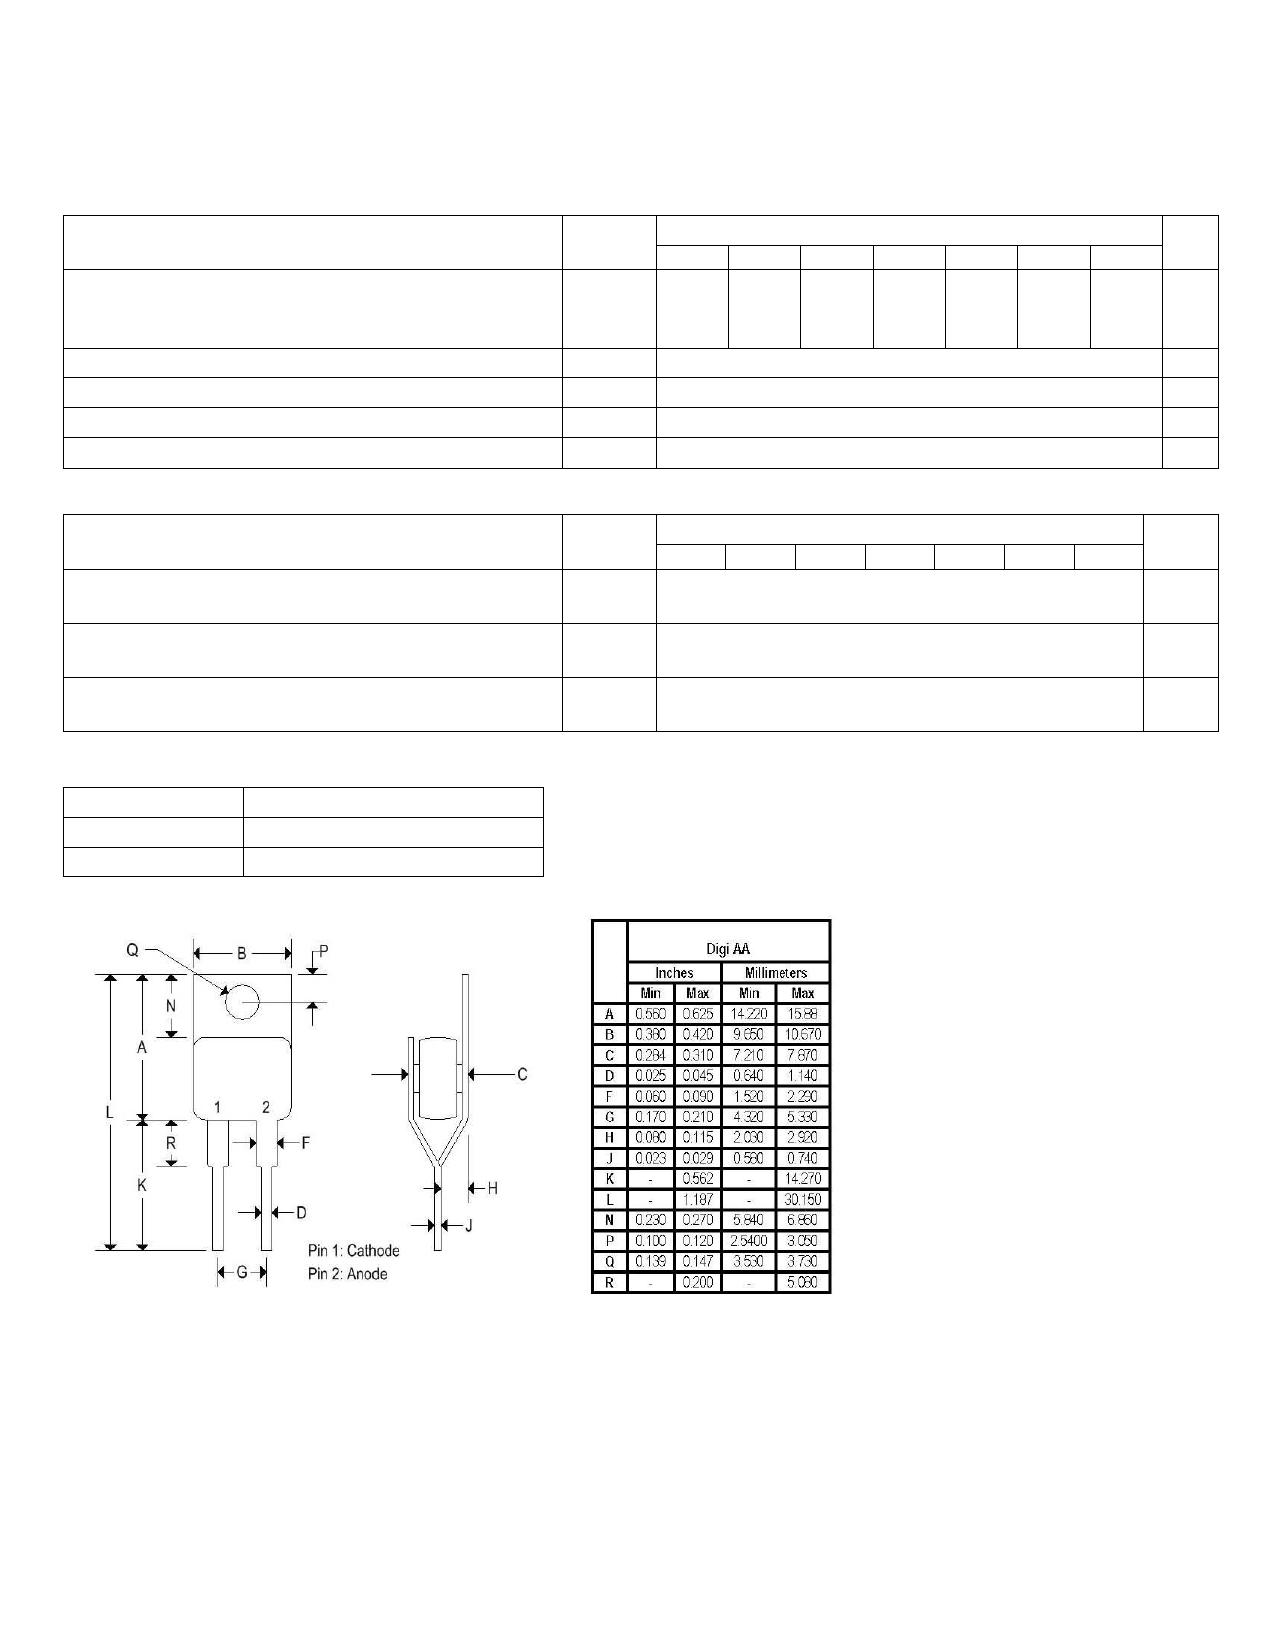 MR2410R 데이터시트 및 MR2410R PDF